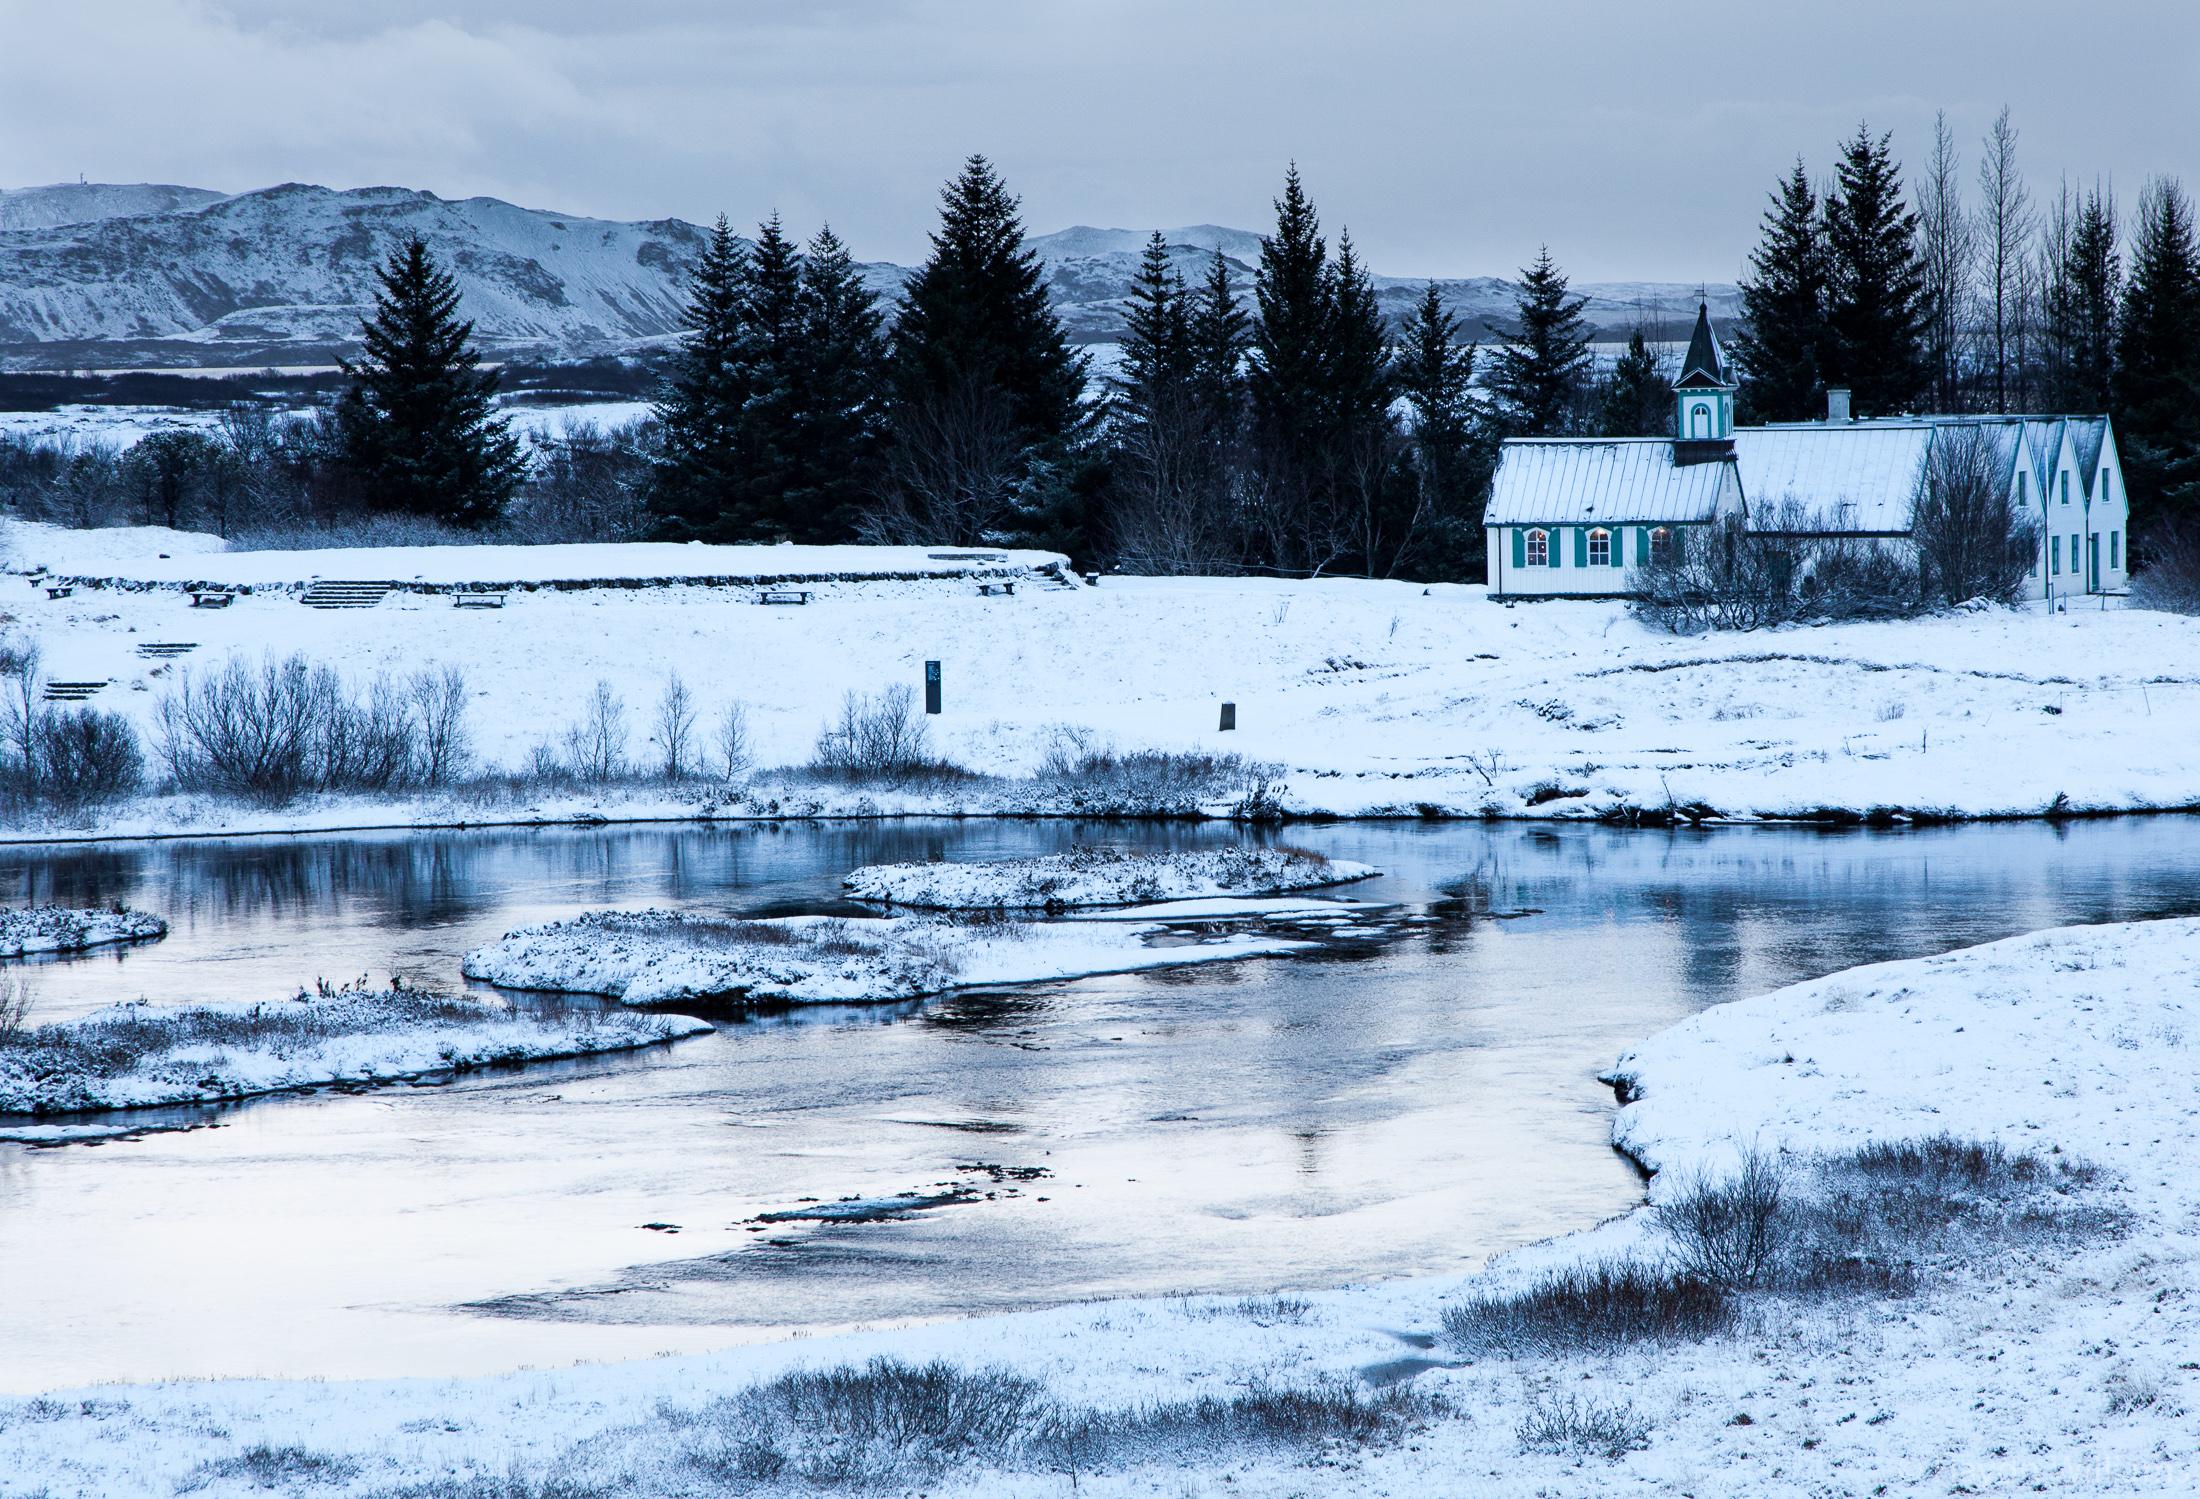 Þingvallakirkja, the church at Þingvellir National Park. © Haydn Williams 2019